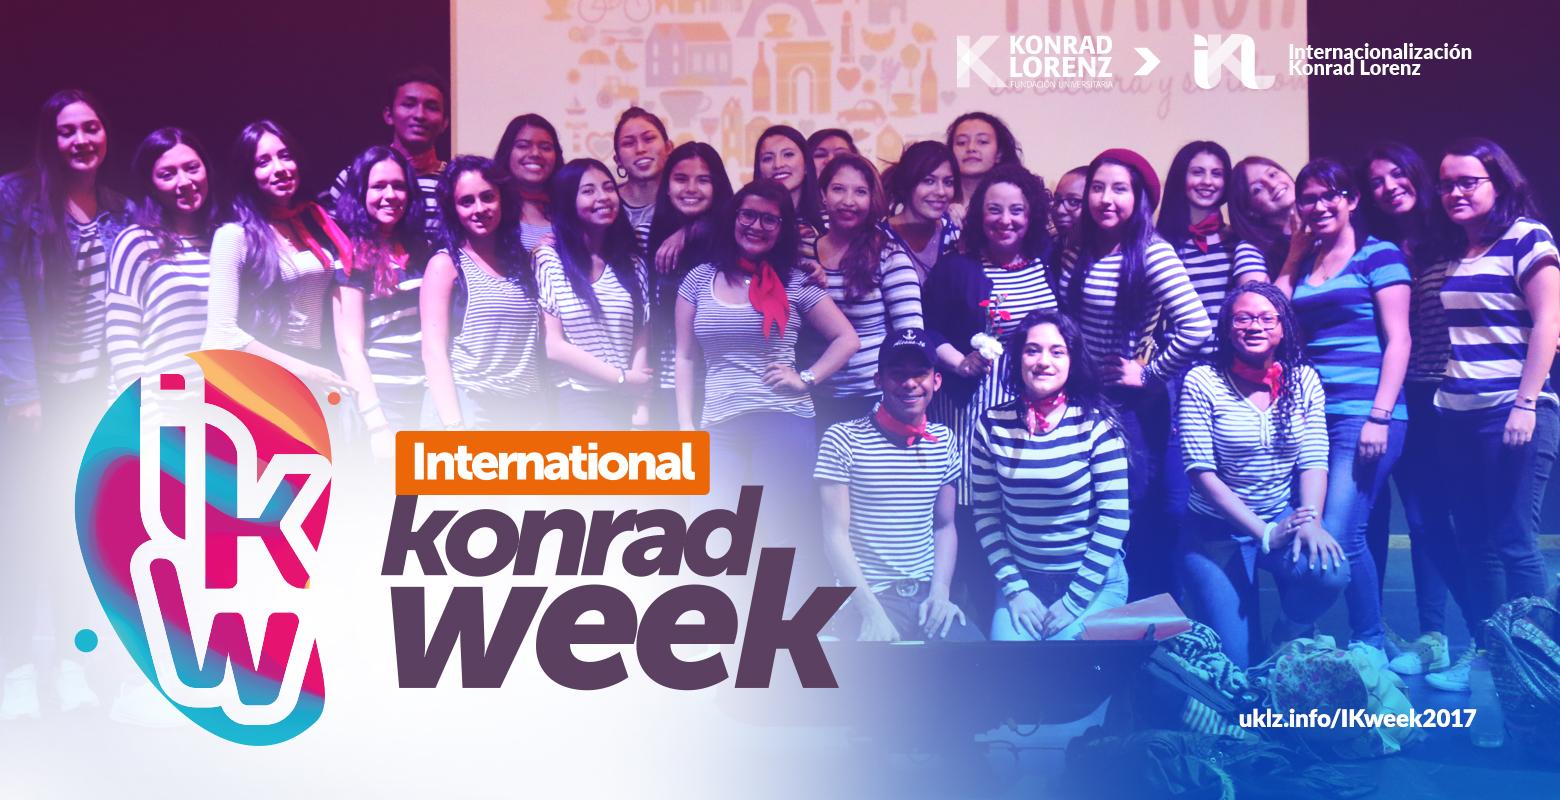 7th International Konrad Week